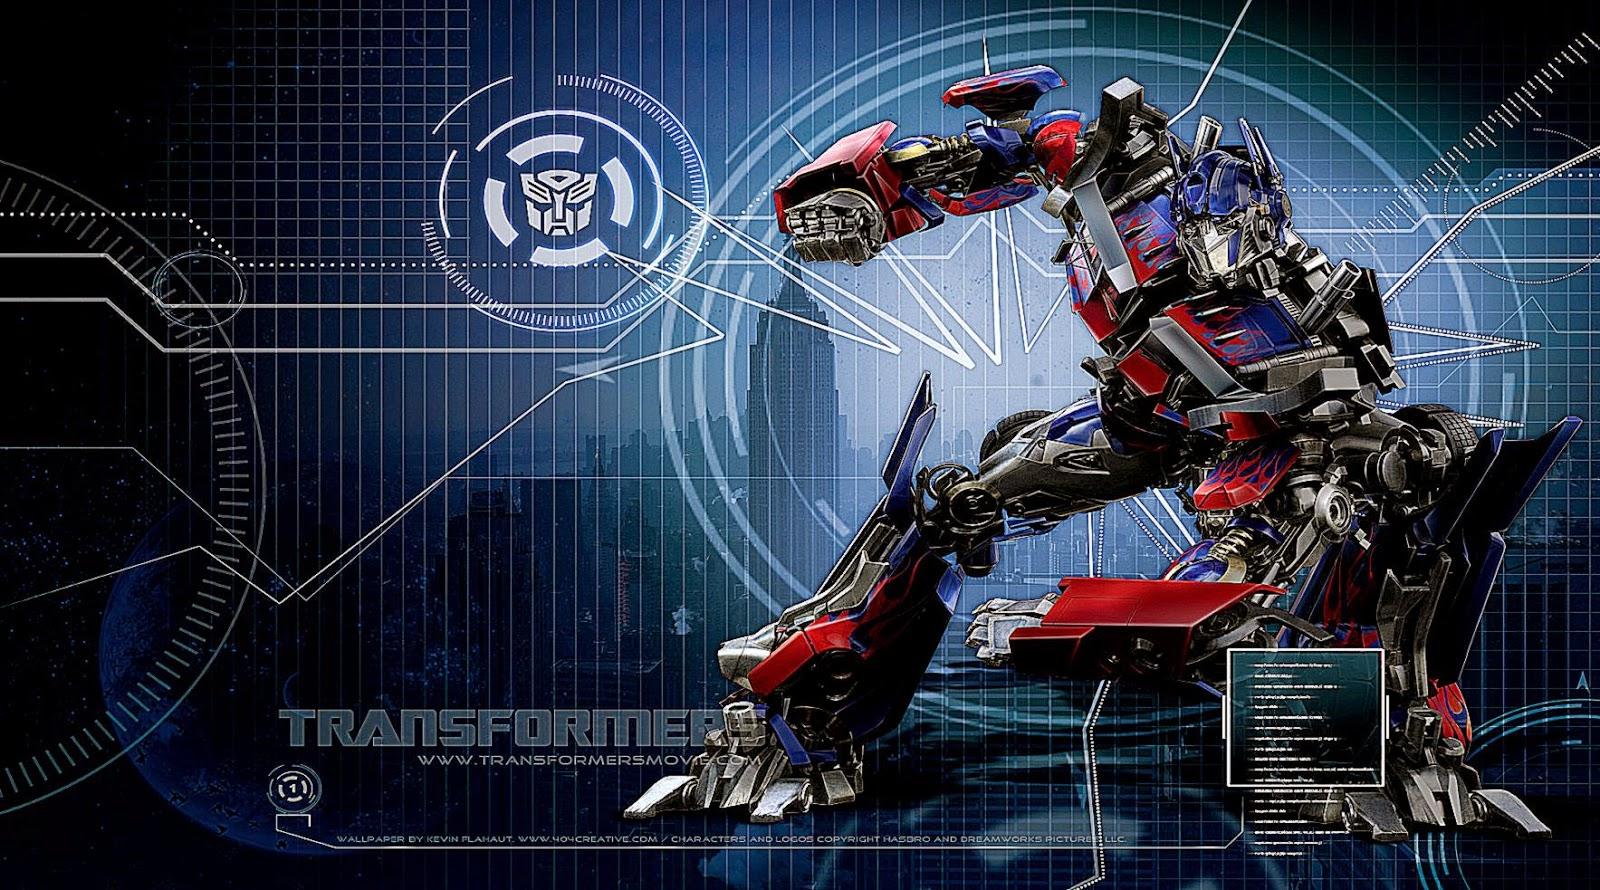 Transformers Animated Desktop Wallpaper Anime HD Wallpapers 1600x890